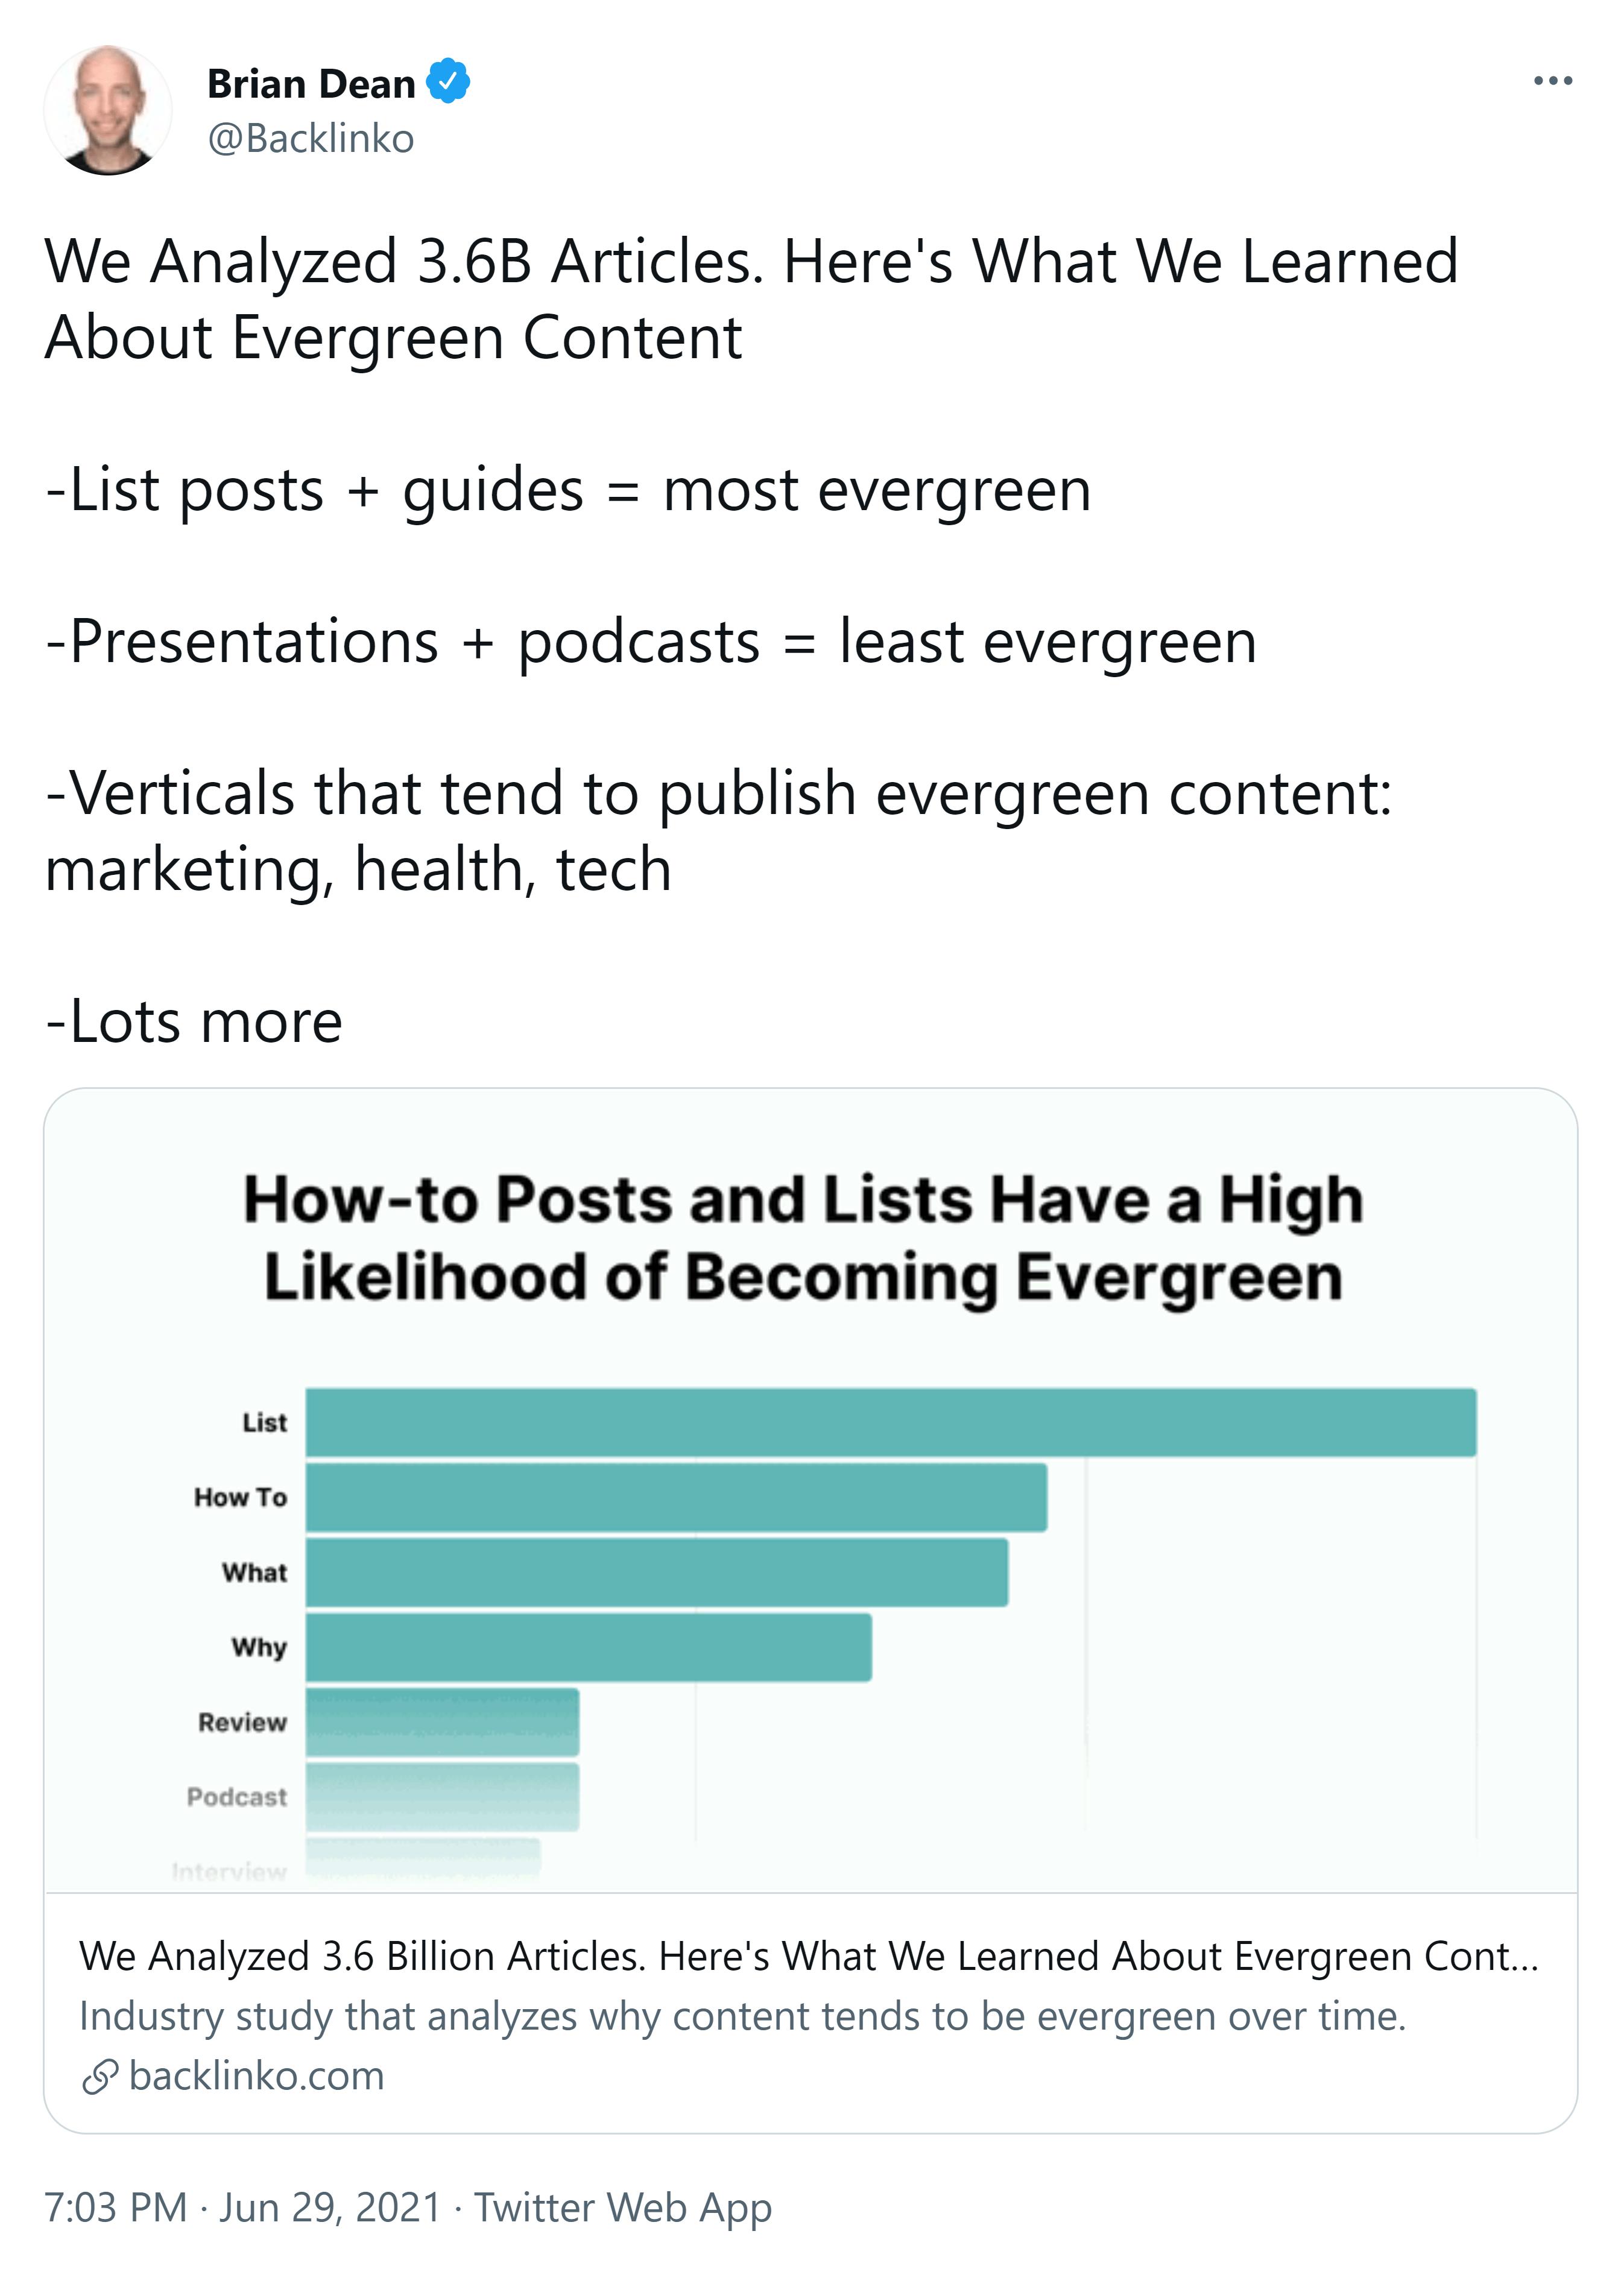 Backlinko – Tweet with chart